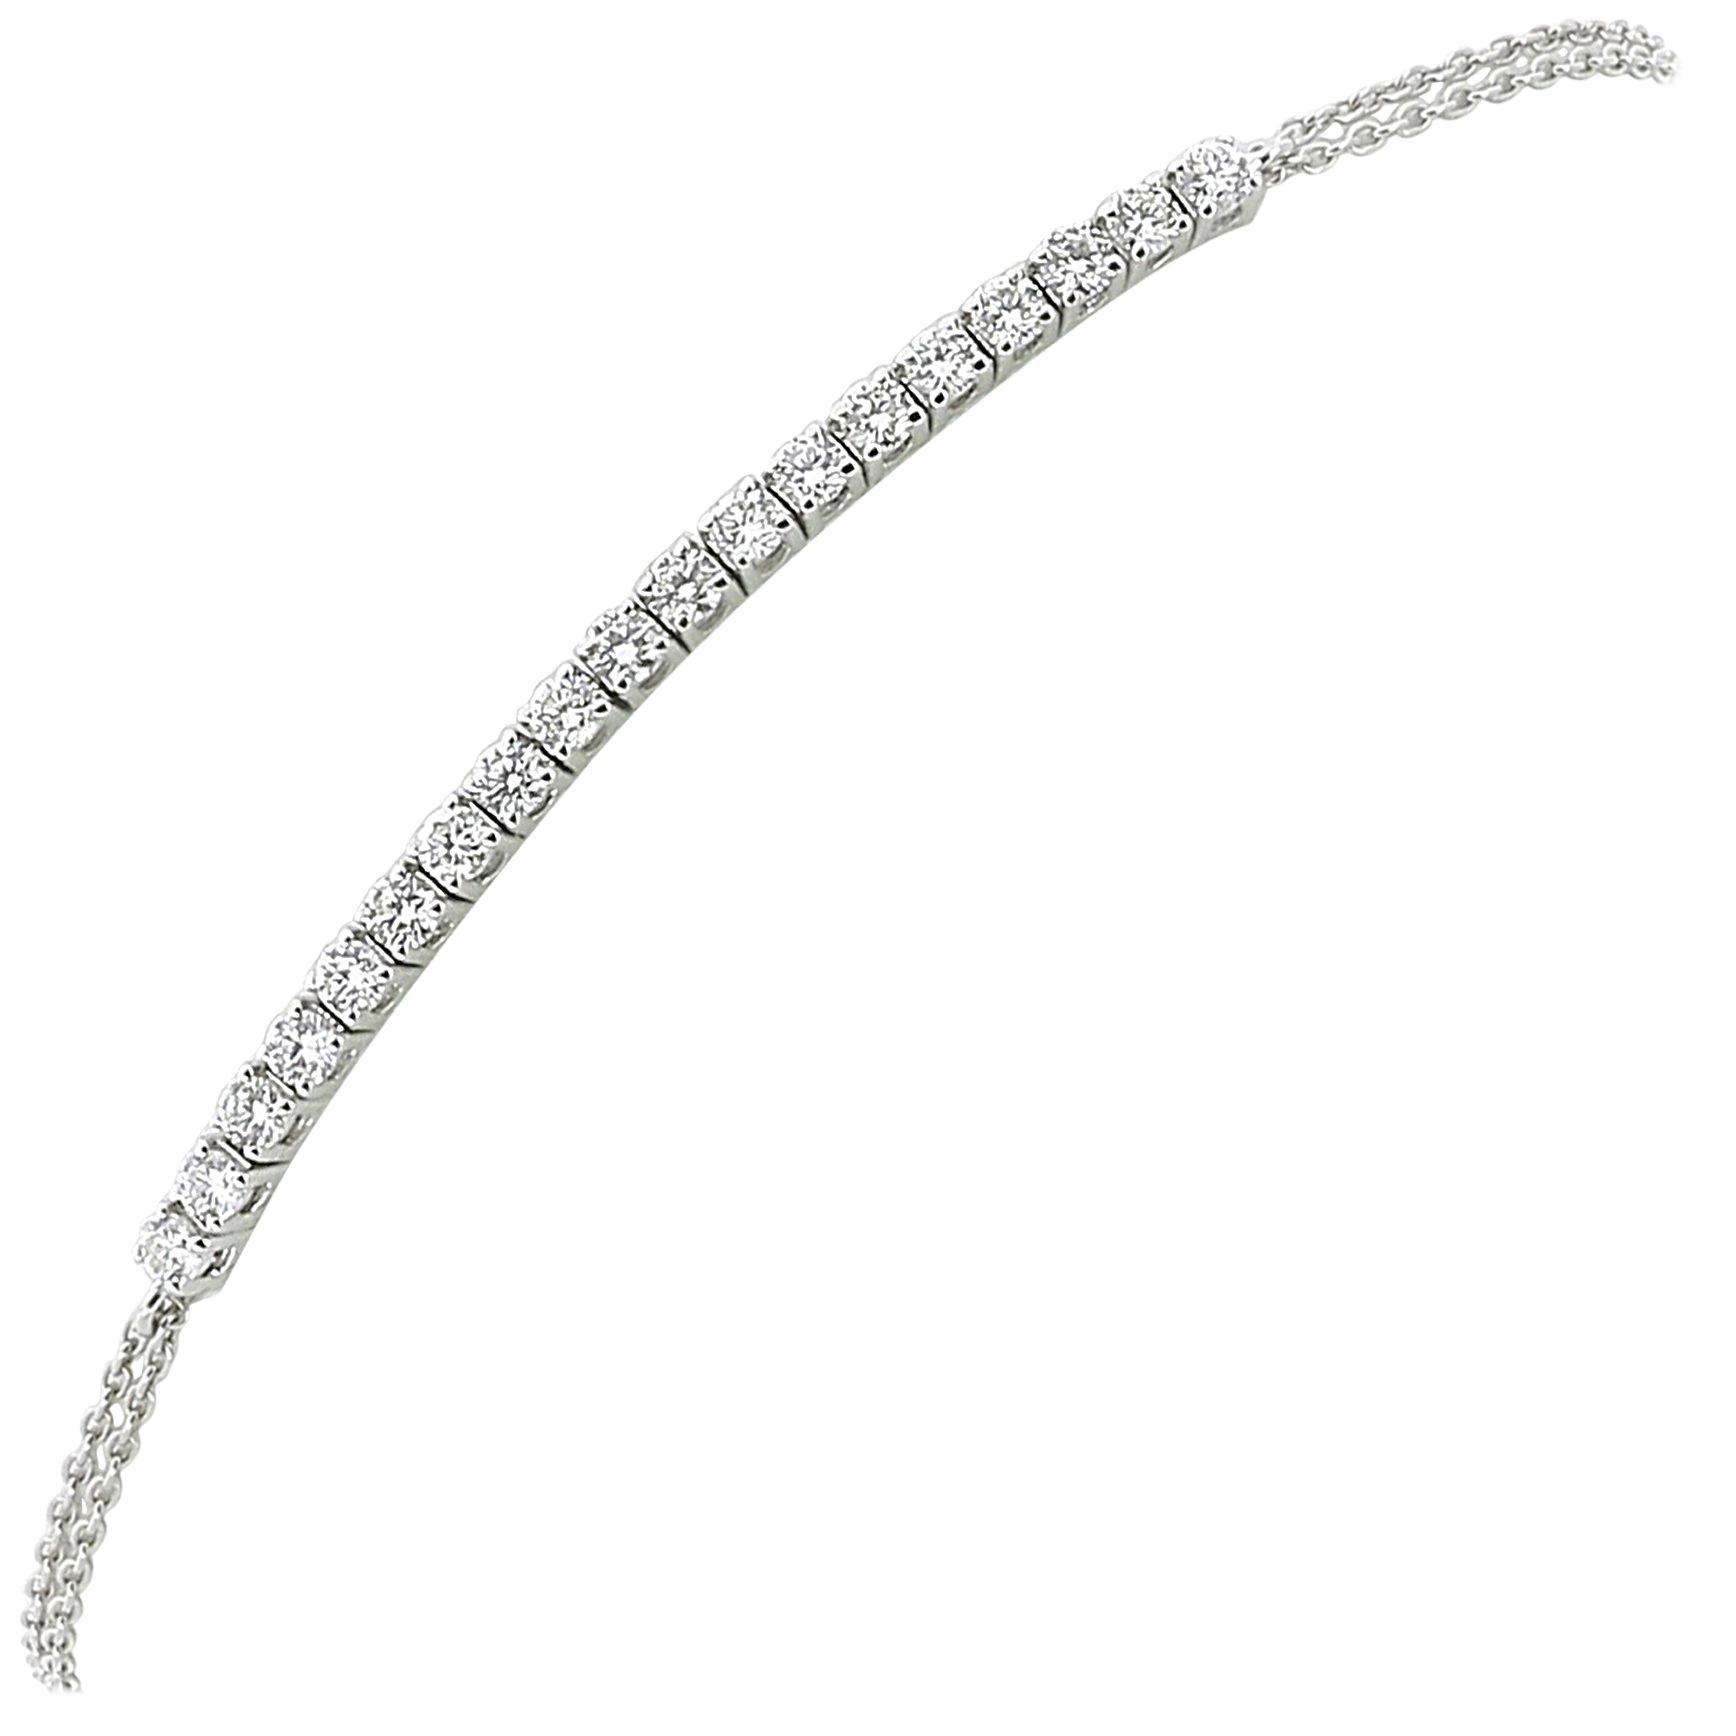 0.60 Carat GVS Round White Diamond Tennis Bracelet 18K WhiteGold/ Chain Bracelet